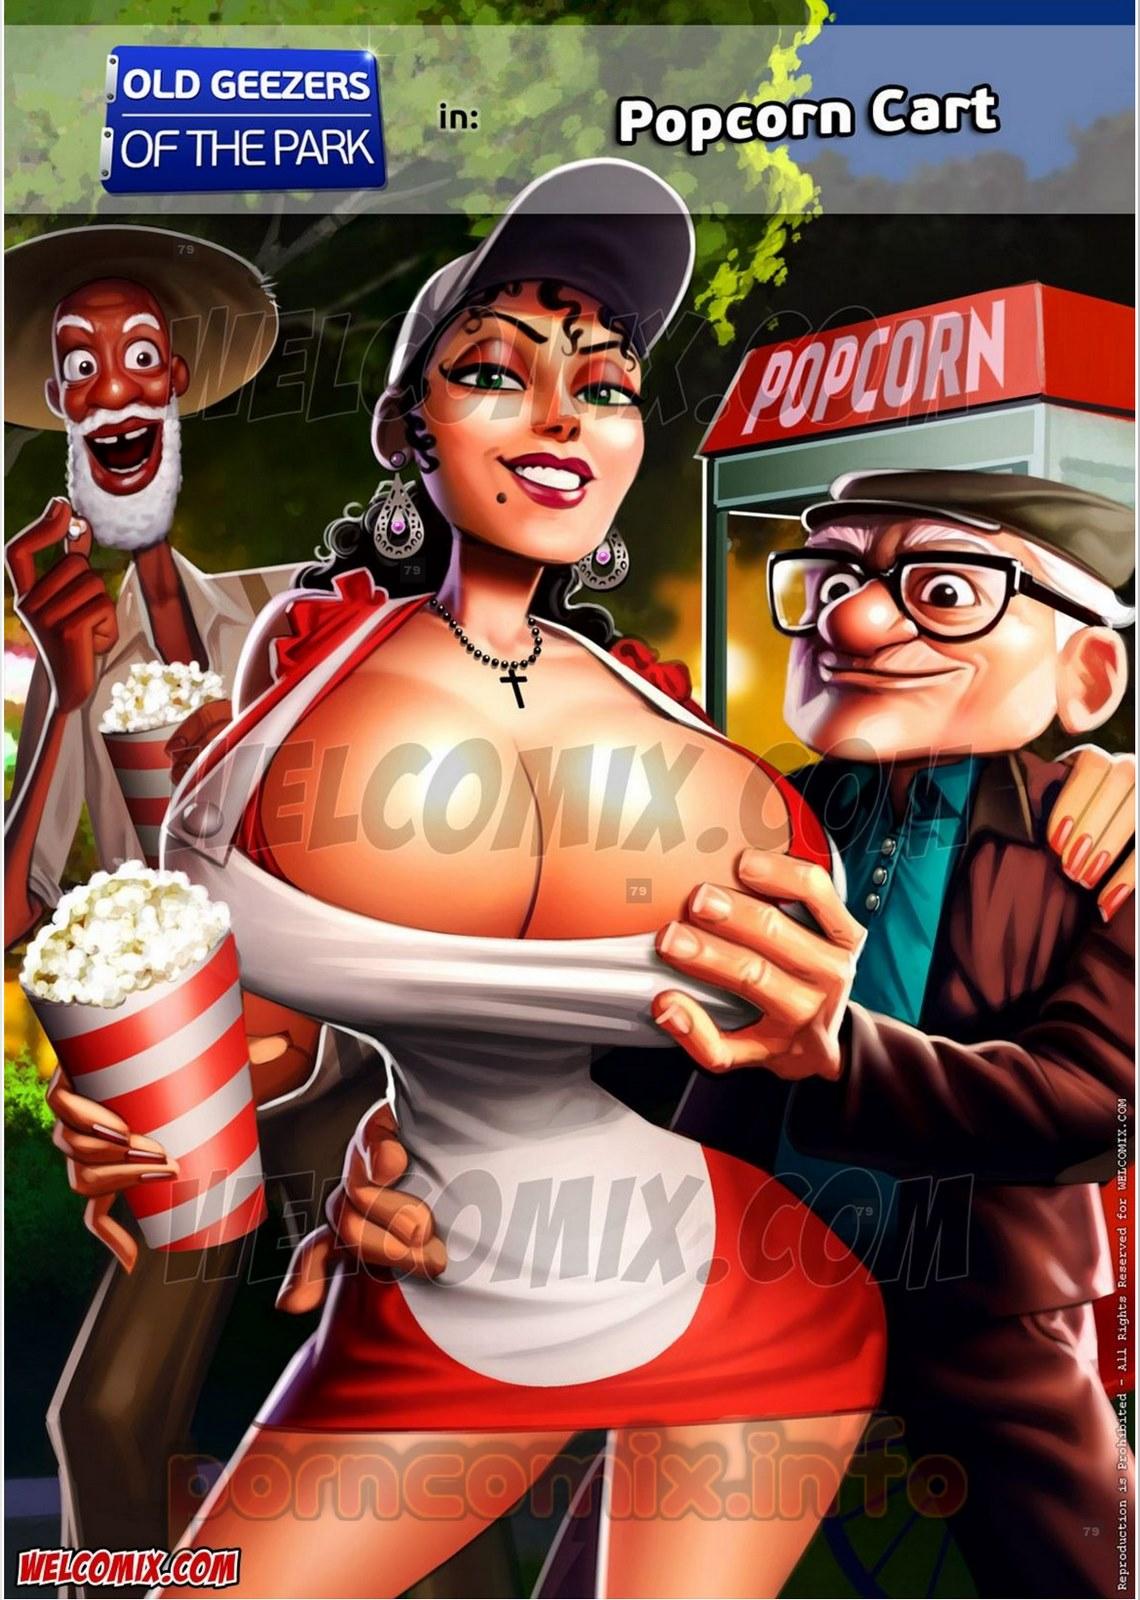 SureFap xxx porno Crossover - [WelComix][Jaguar] - Old Geezers of Parks #2 - Popcorn Cart